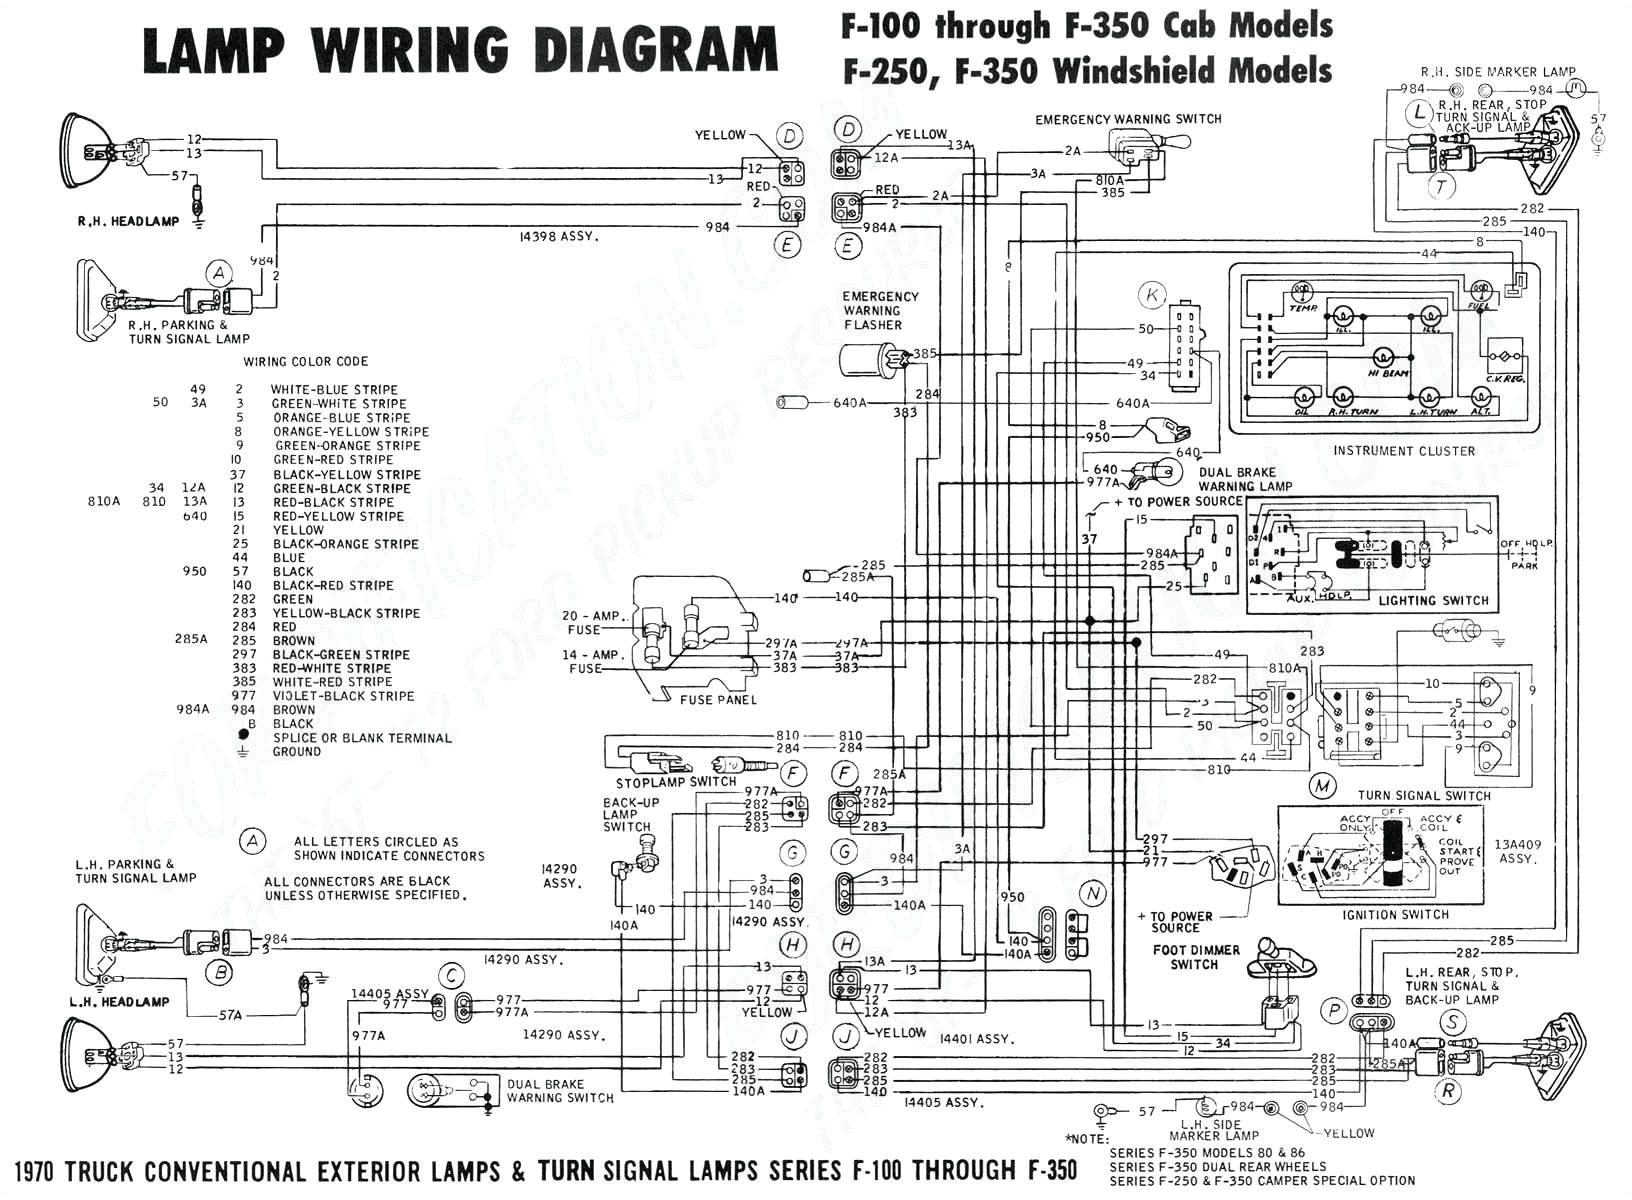 2005 ford f150 exhaust system diagram elegant 2005 ford f 150 starter wiring diagram parts free wiring jpg